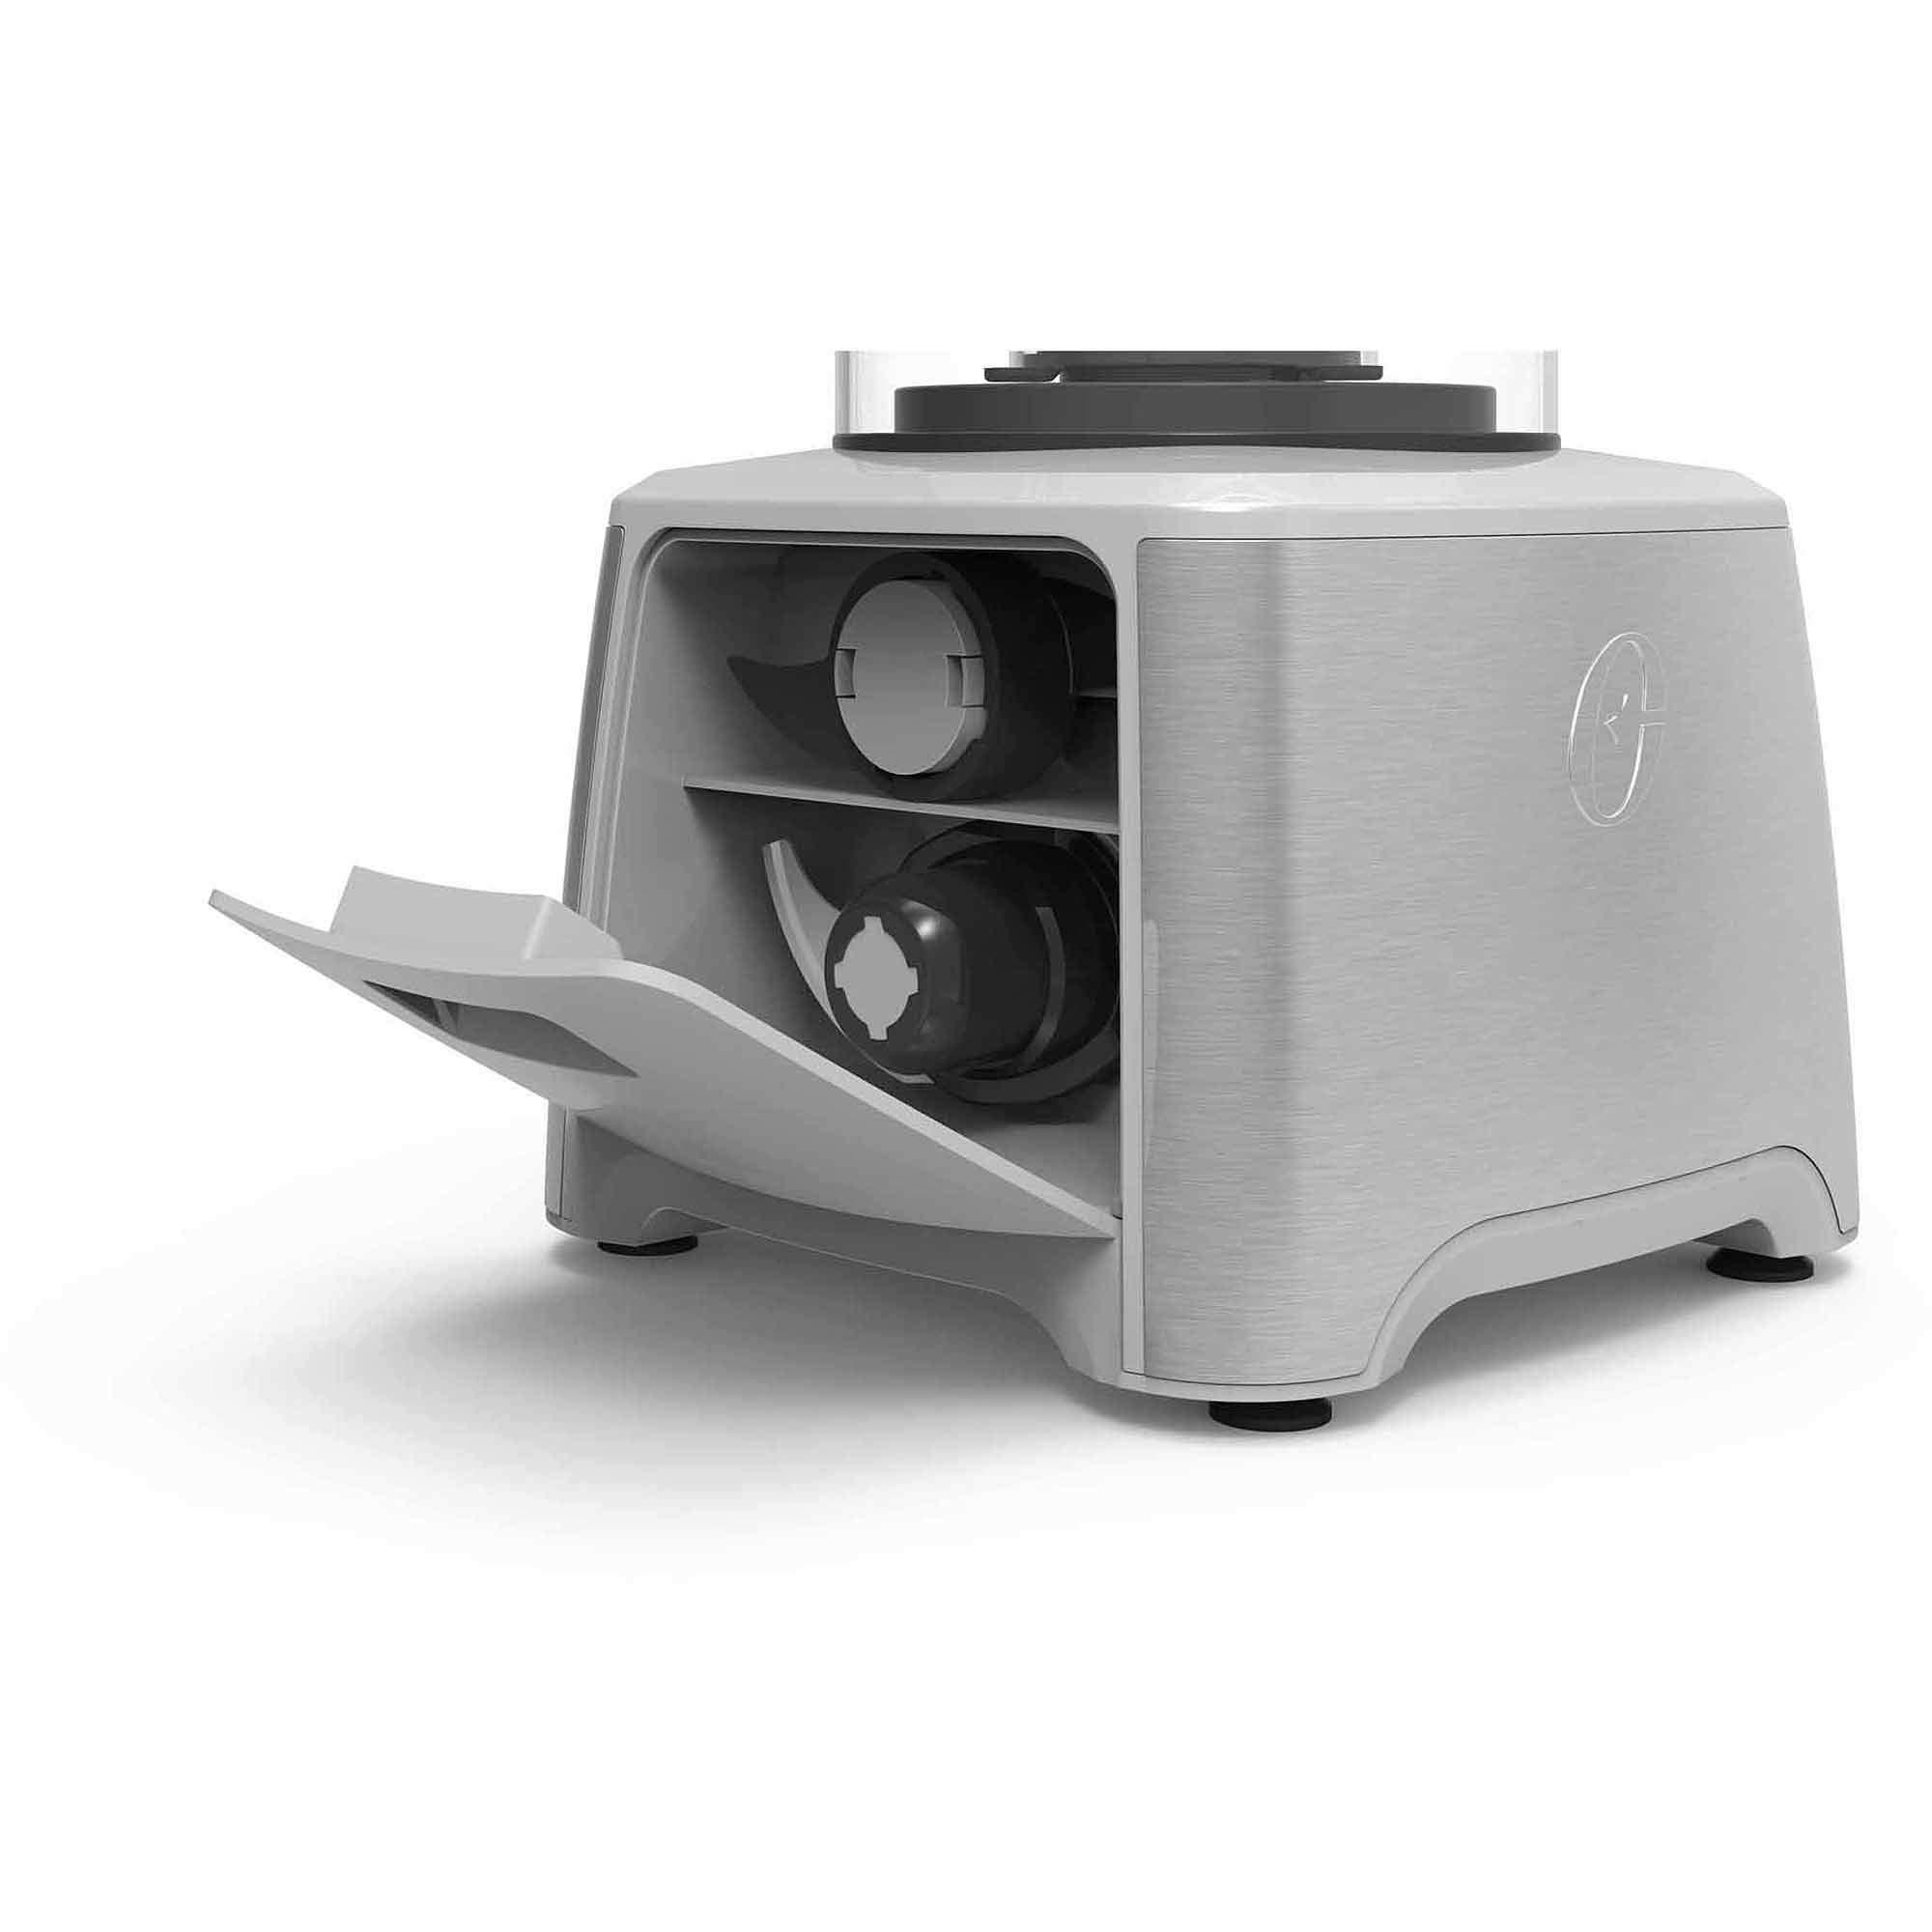 Oster Designed for Life FPSTFP5273-DFL 14-Cup Food Processor - 550W